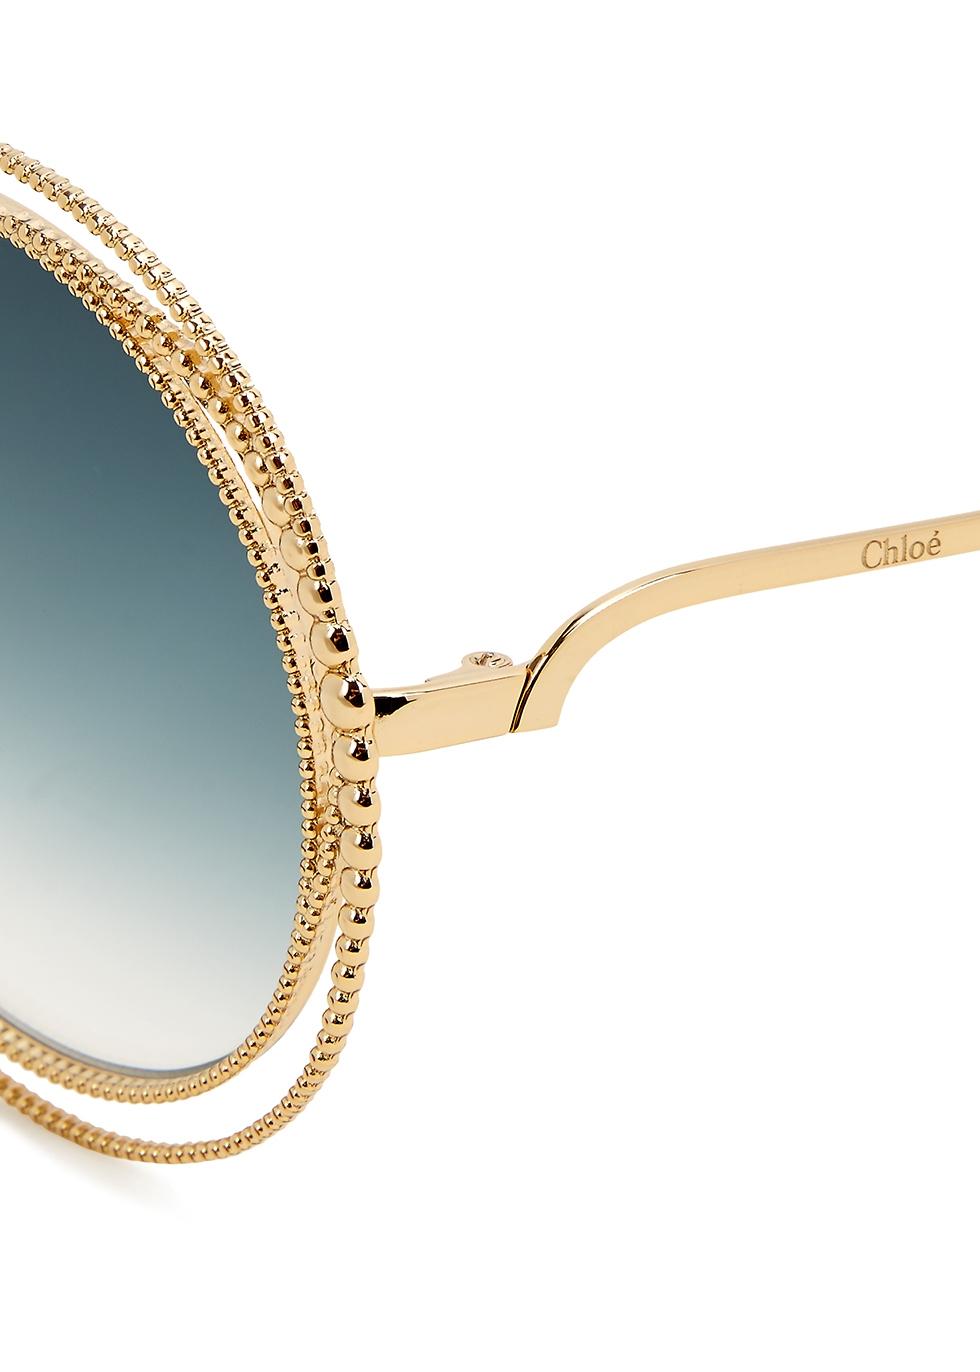 Carlina oversized round-frame sunglasses - Chloé